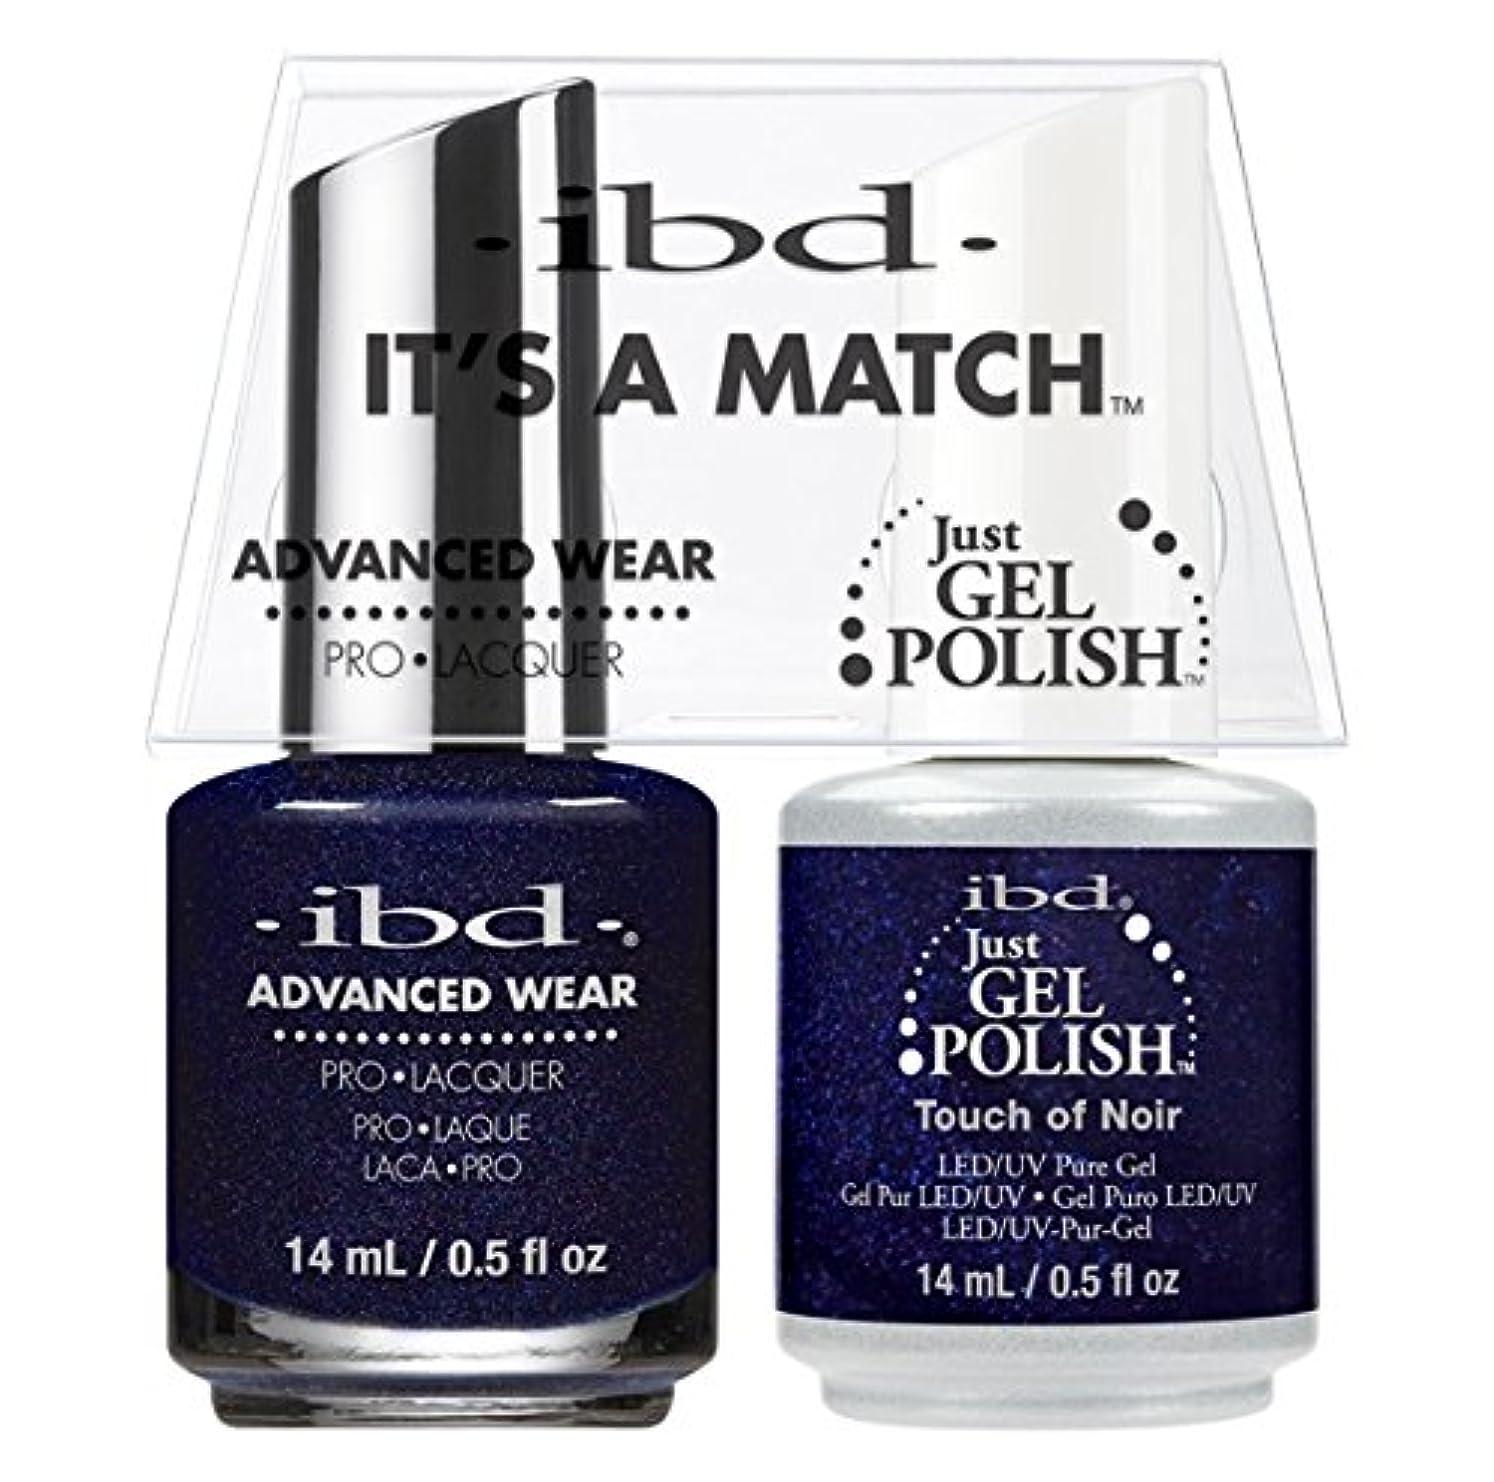 ibd - It's A Match -Duo Pack- Touch of Noir - 14 mL / 0.5 oz Each